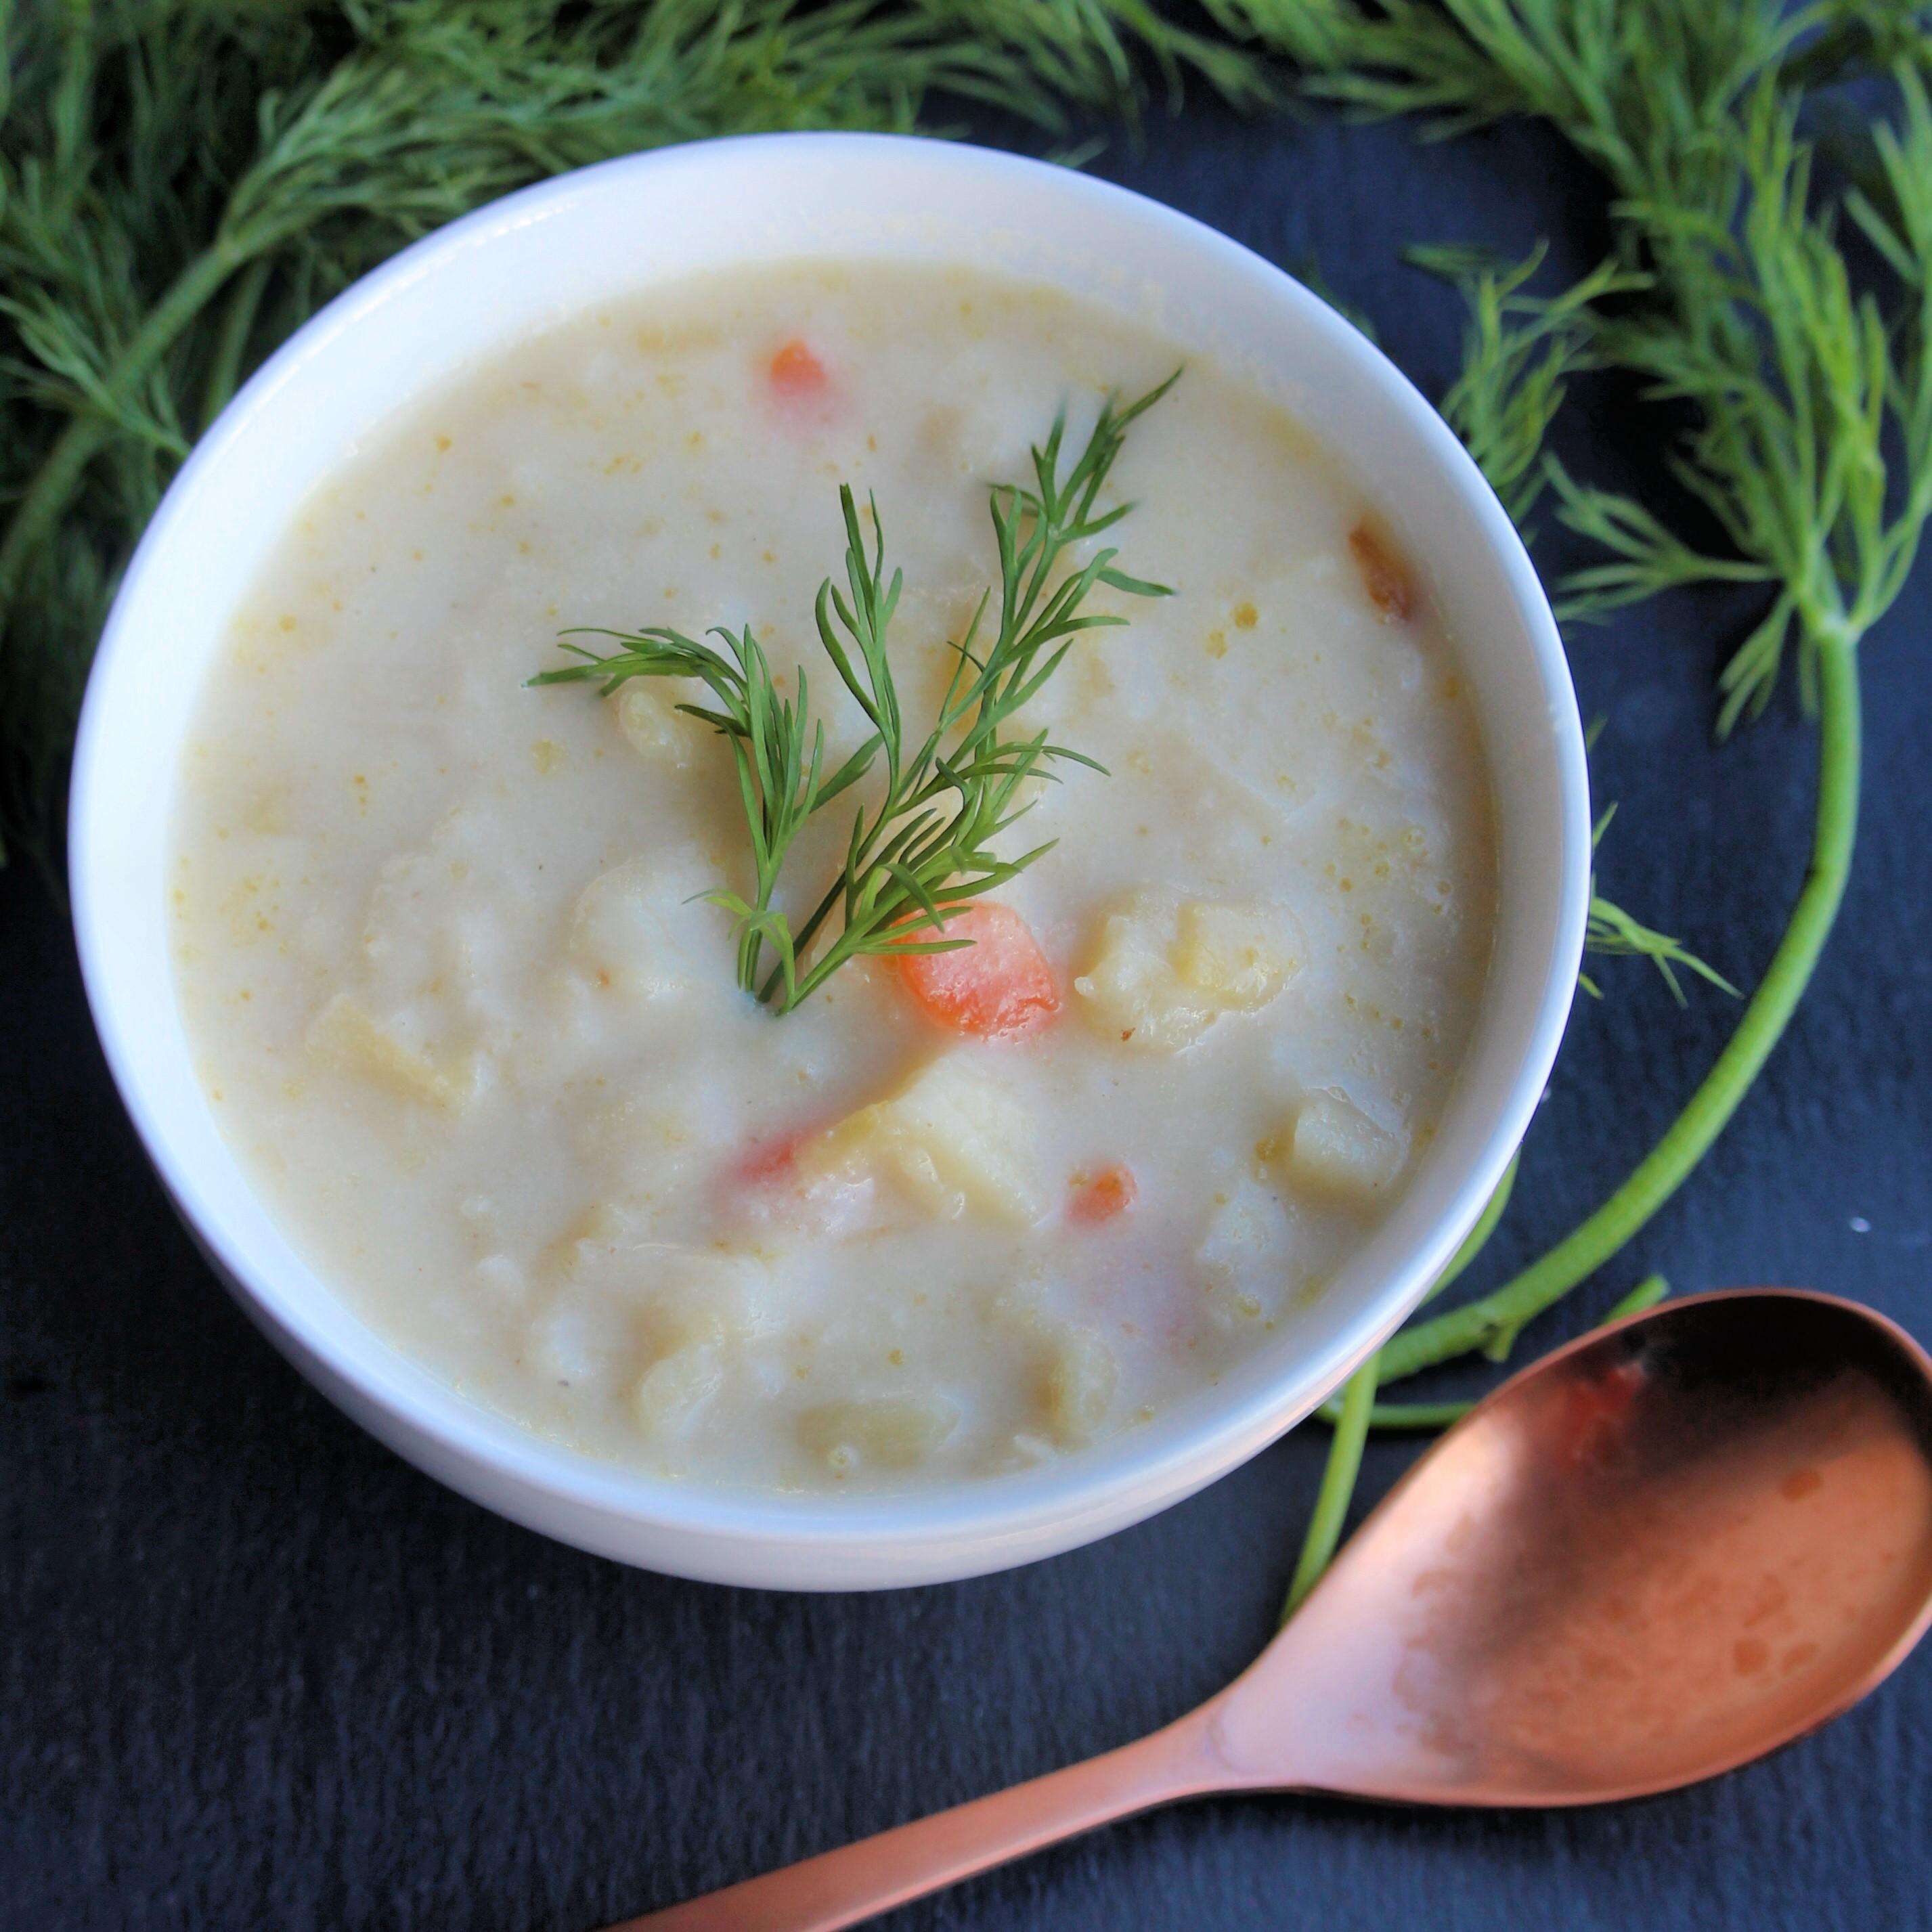 Receita de Alho-poró vegano de panela lenta e receita de sopa de batata